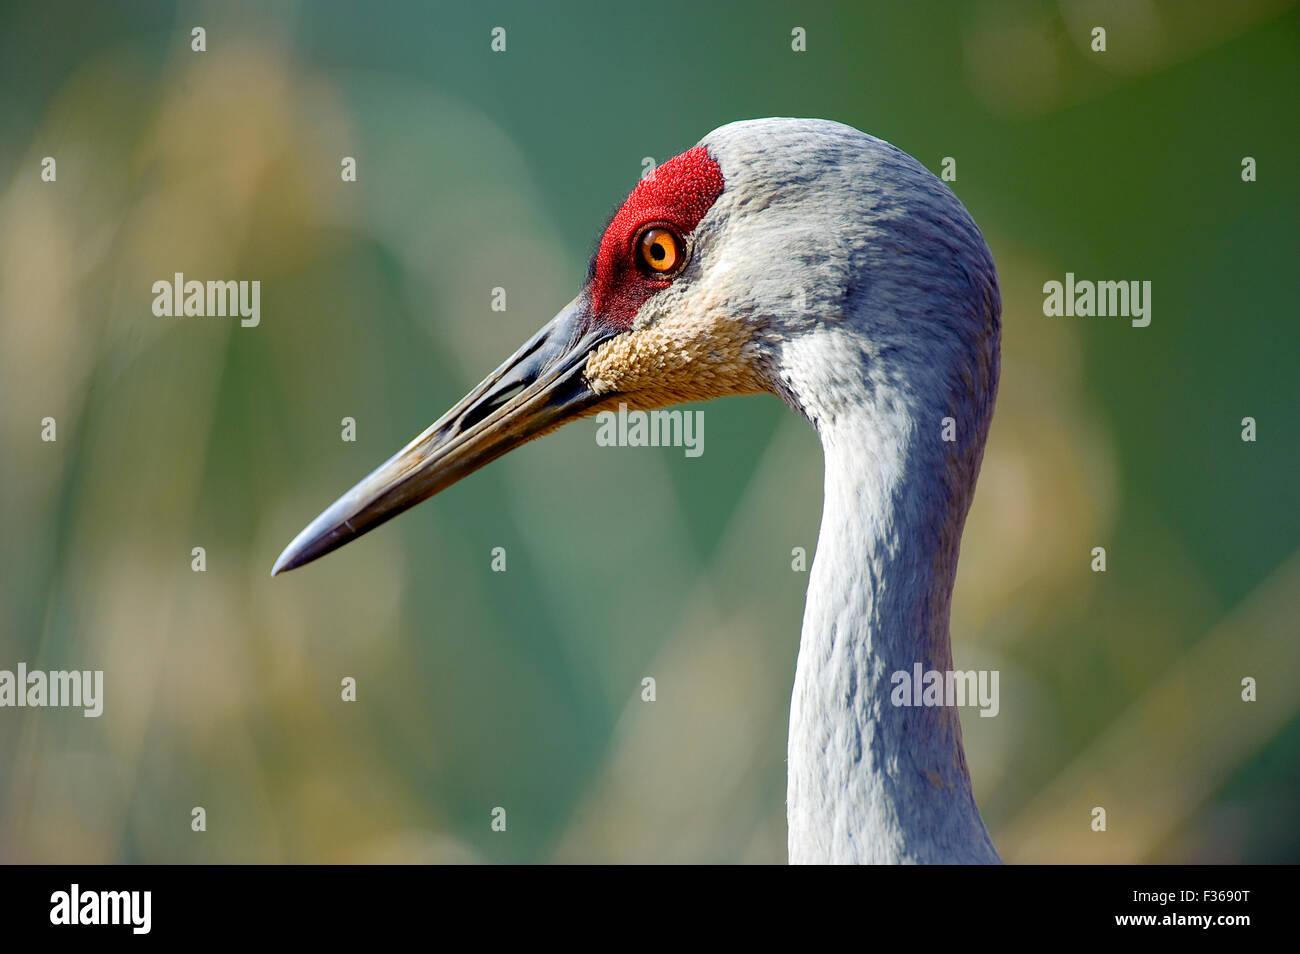 Sandhill Crane (Grus canadensis), George C Reifel Migratory Bird Sanctuary, Vancouver , British Columbia, Canada - Stock Image